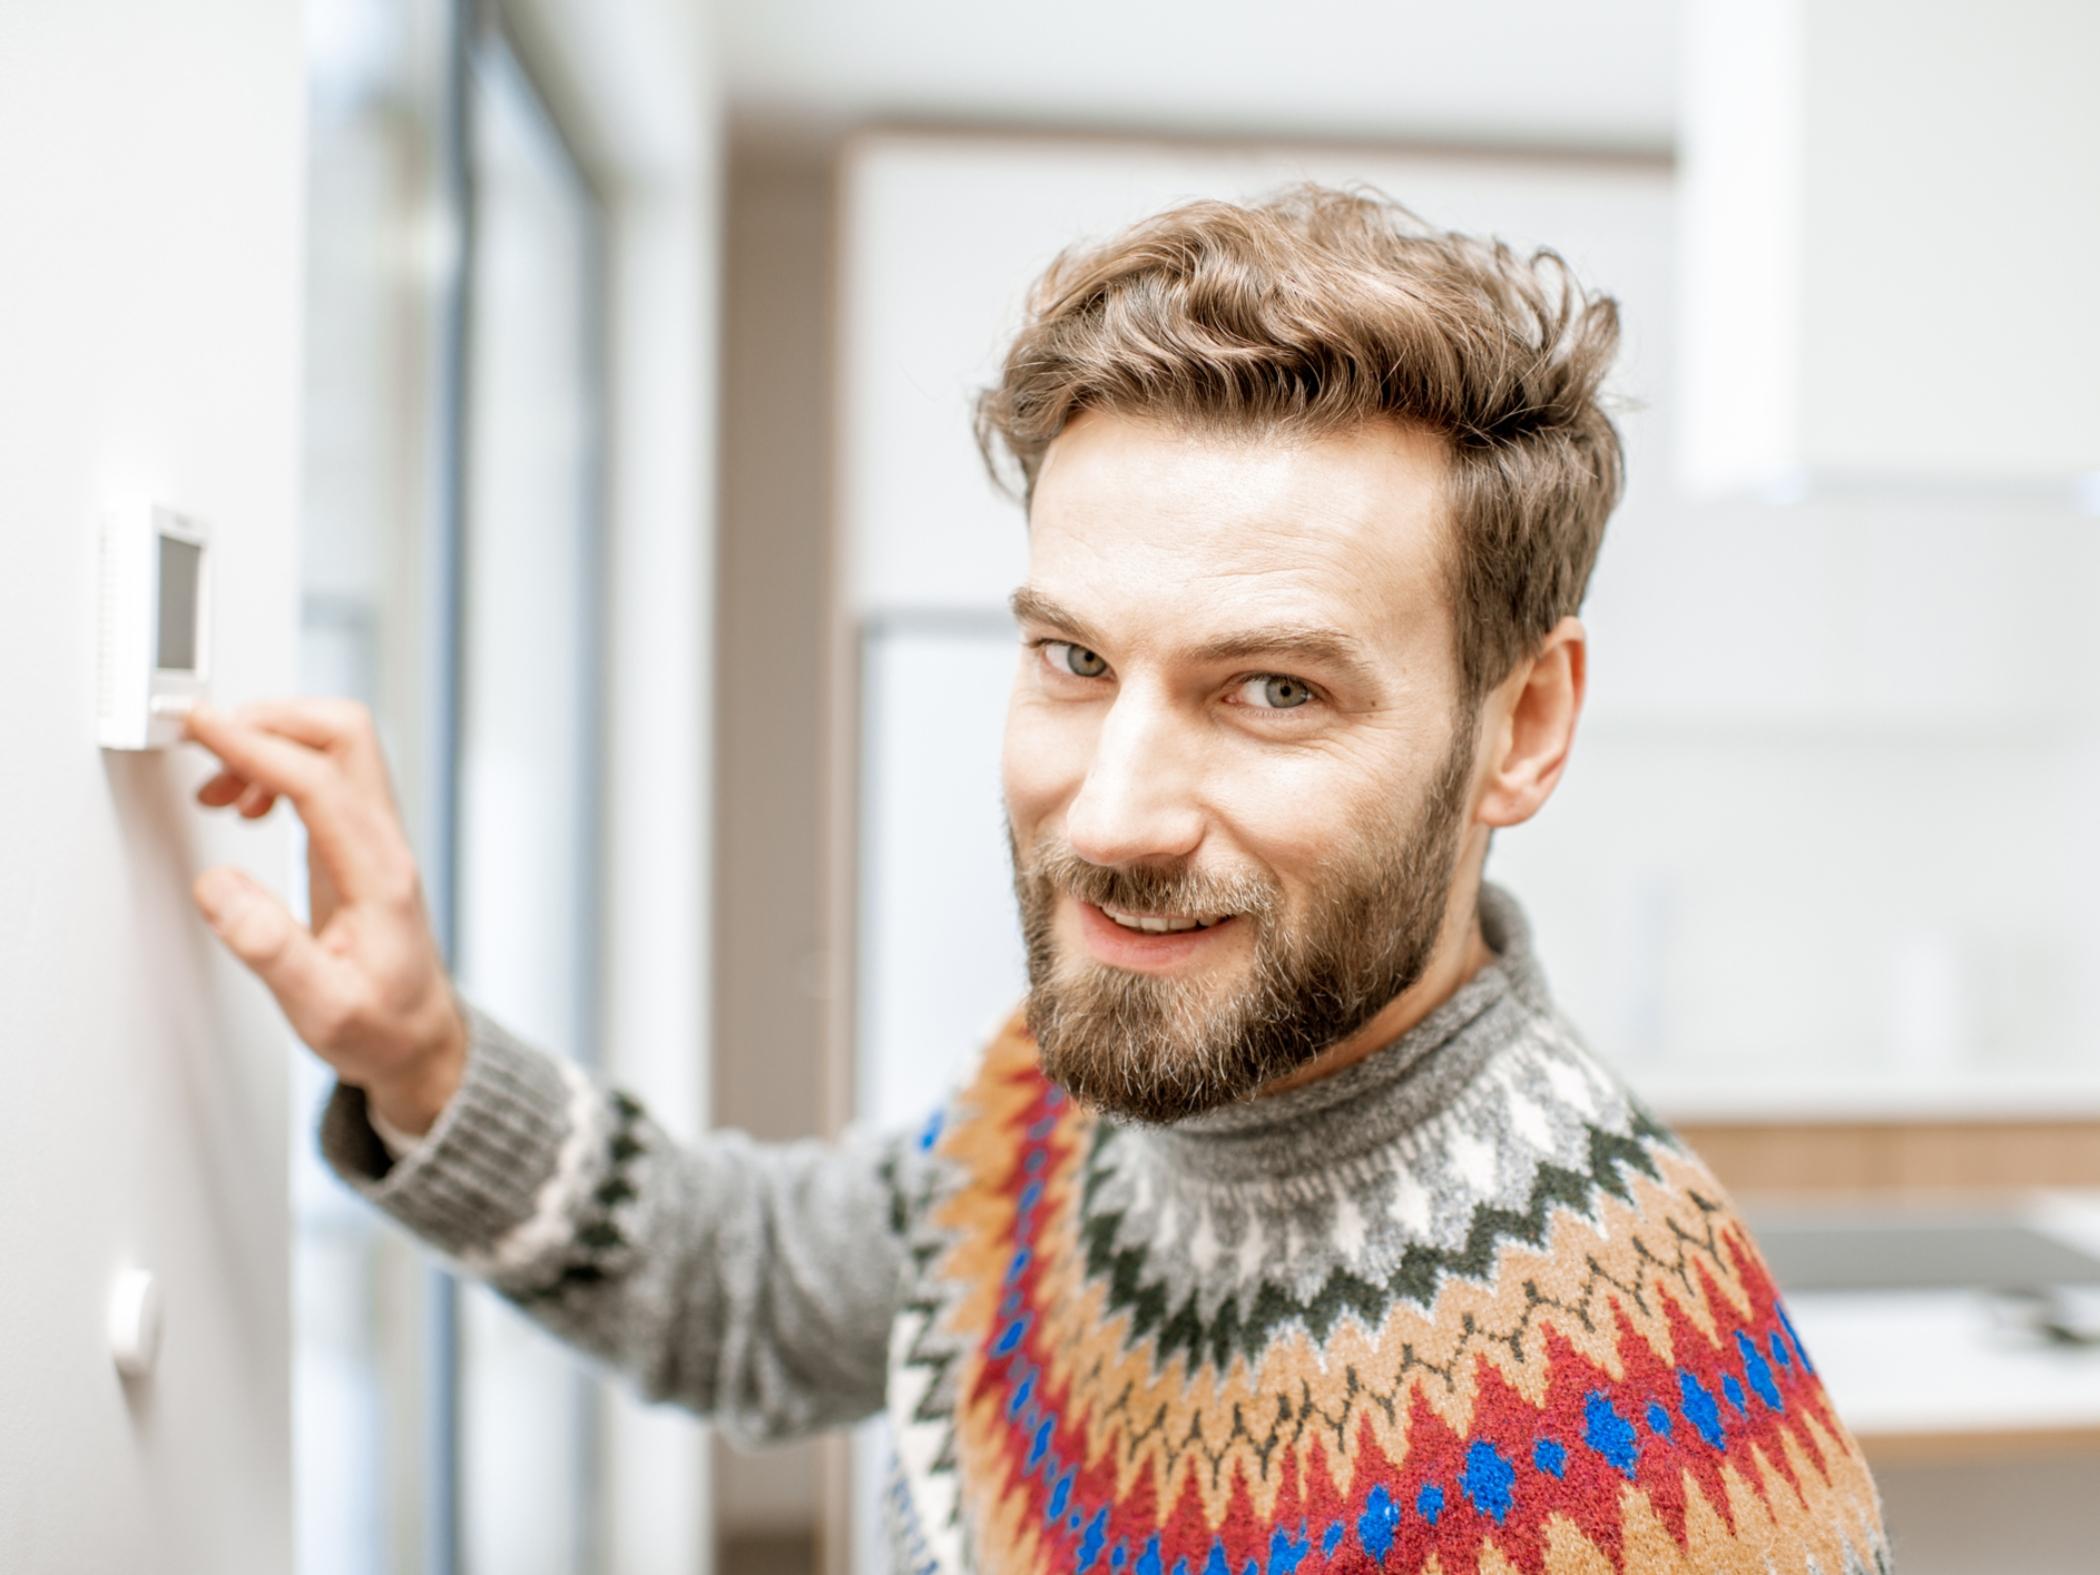 Man at home adjusting thermostat